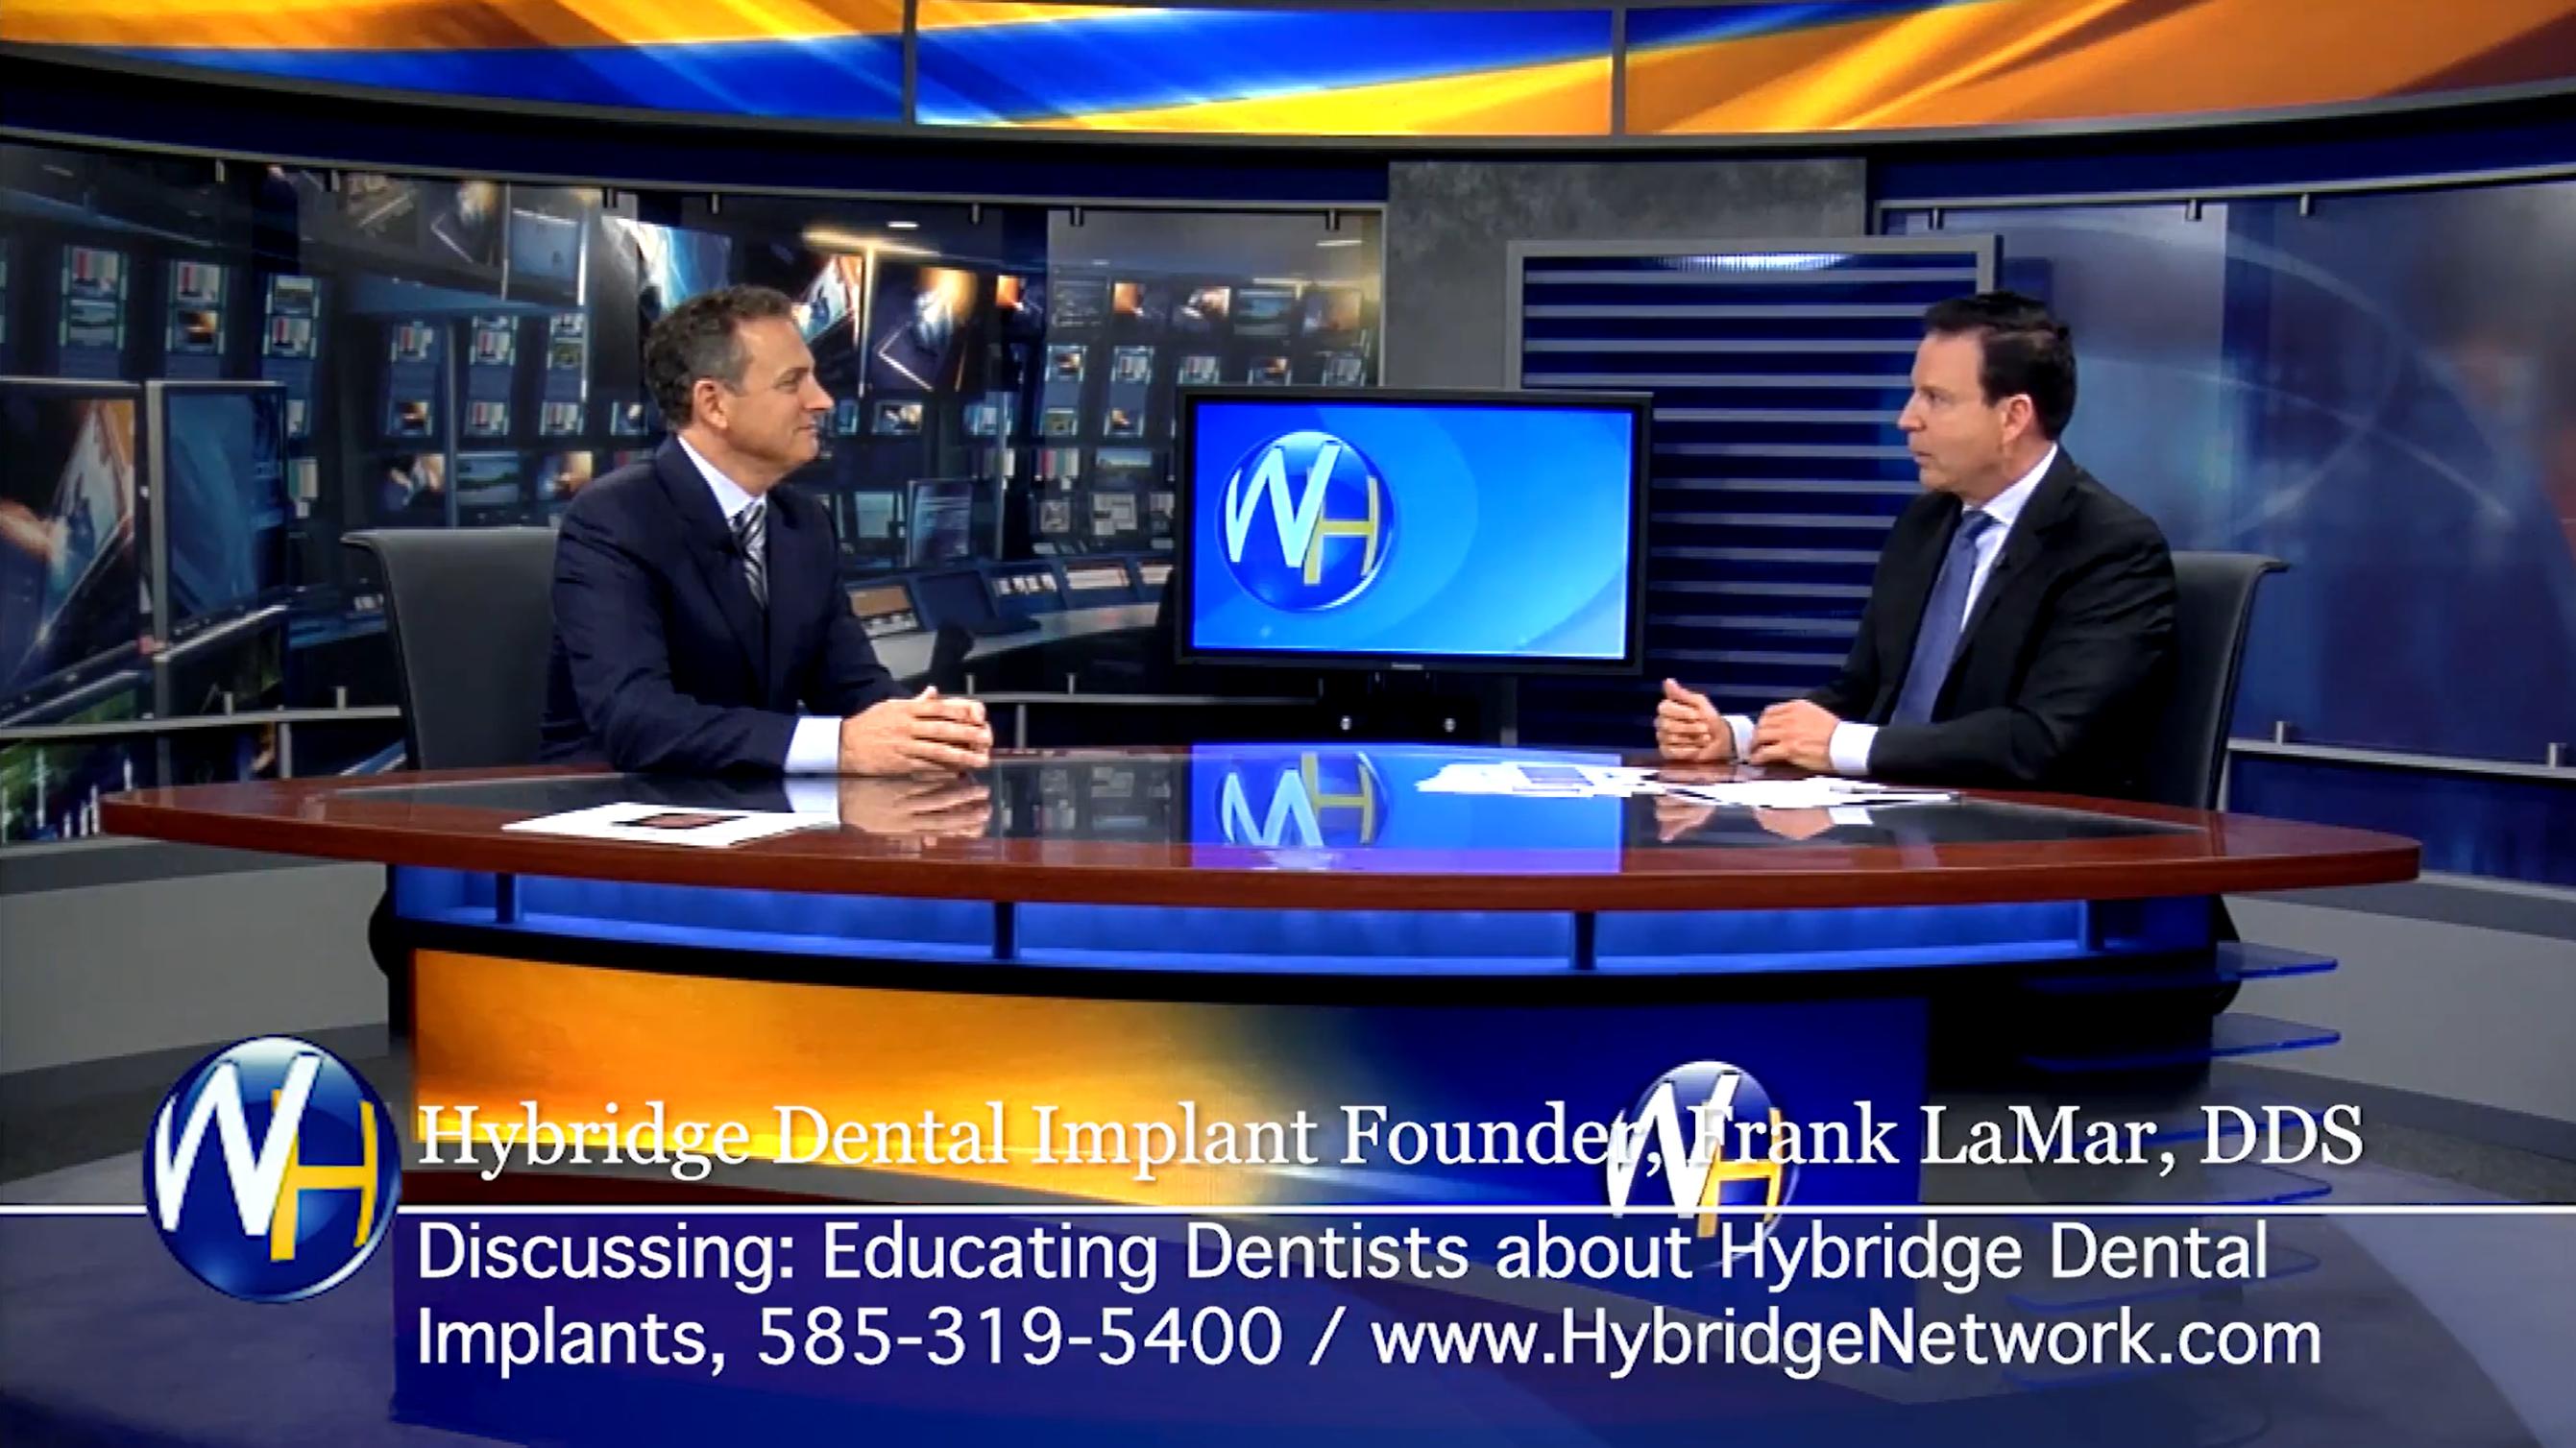 Dr. Frank LaMar Featured on National Wellness Hour TV Program